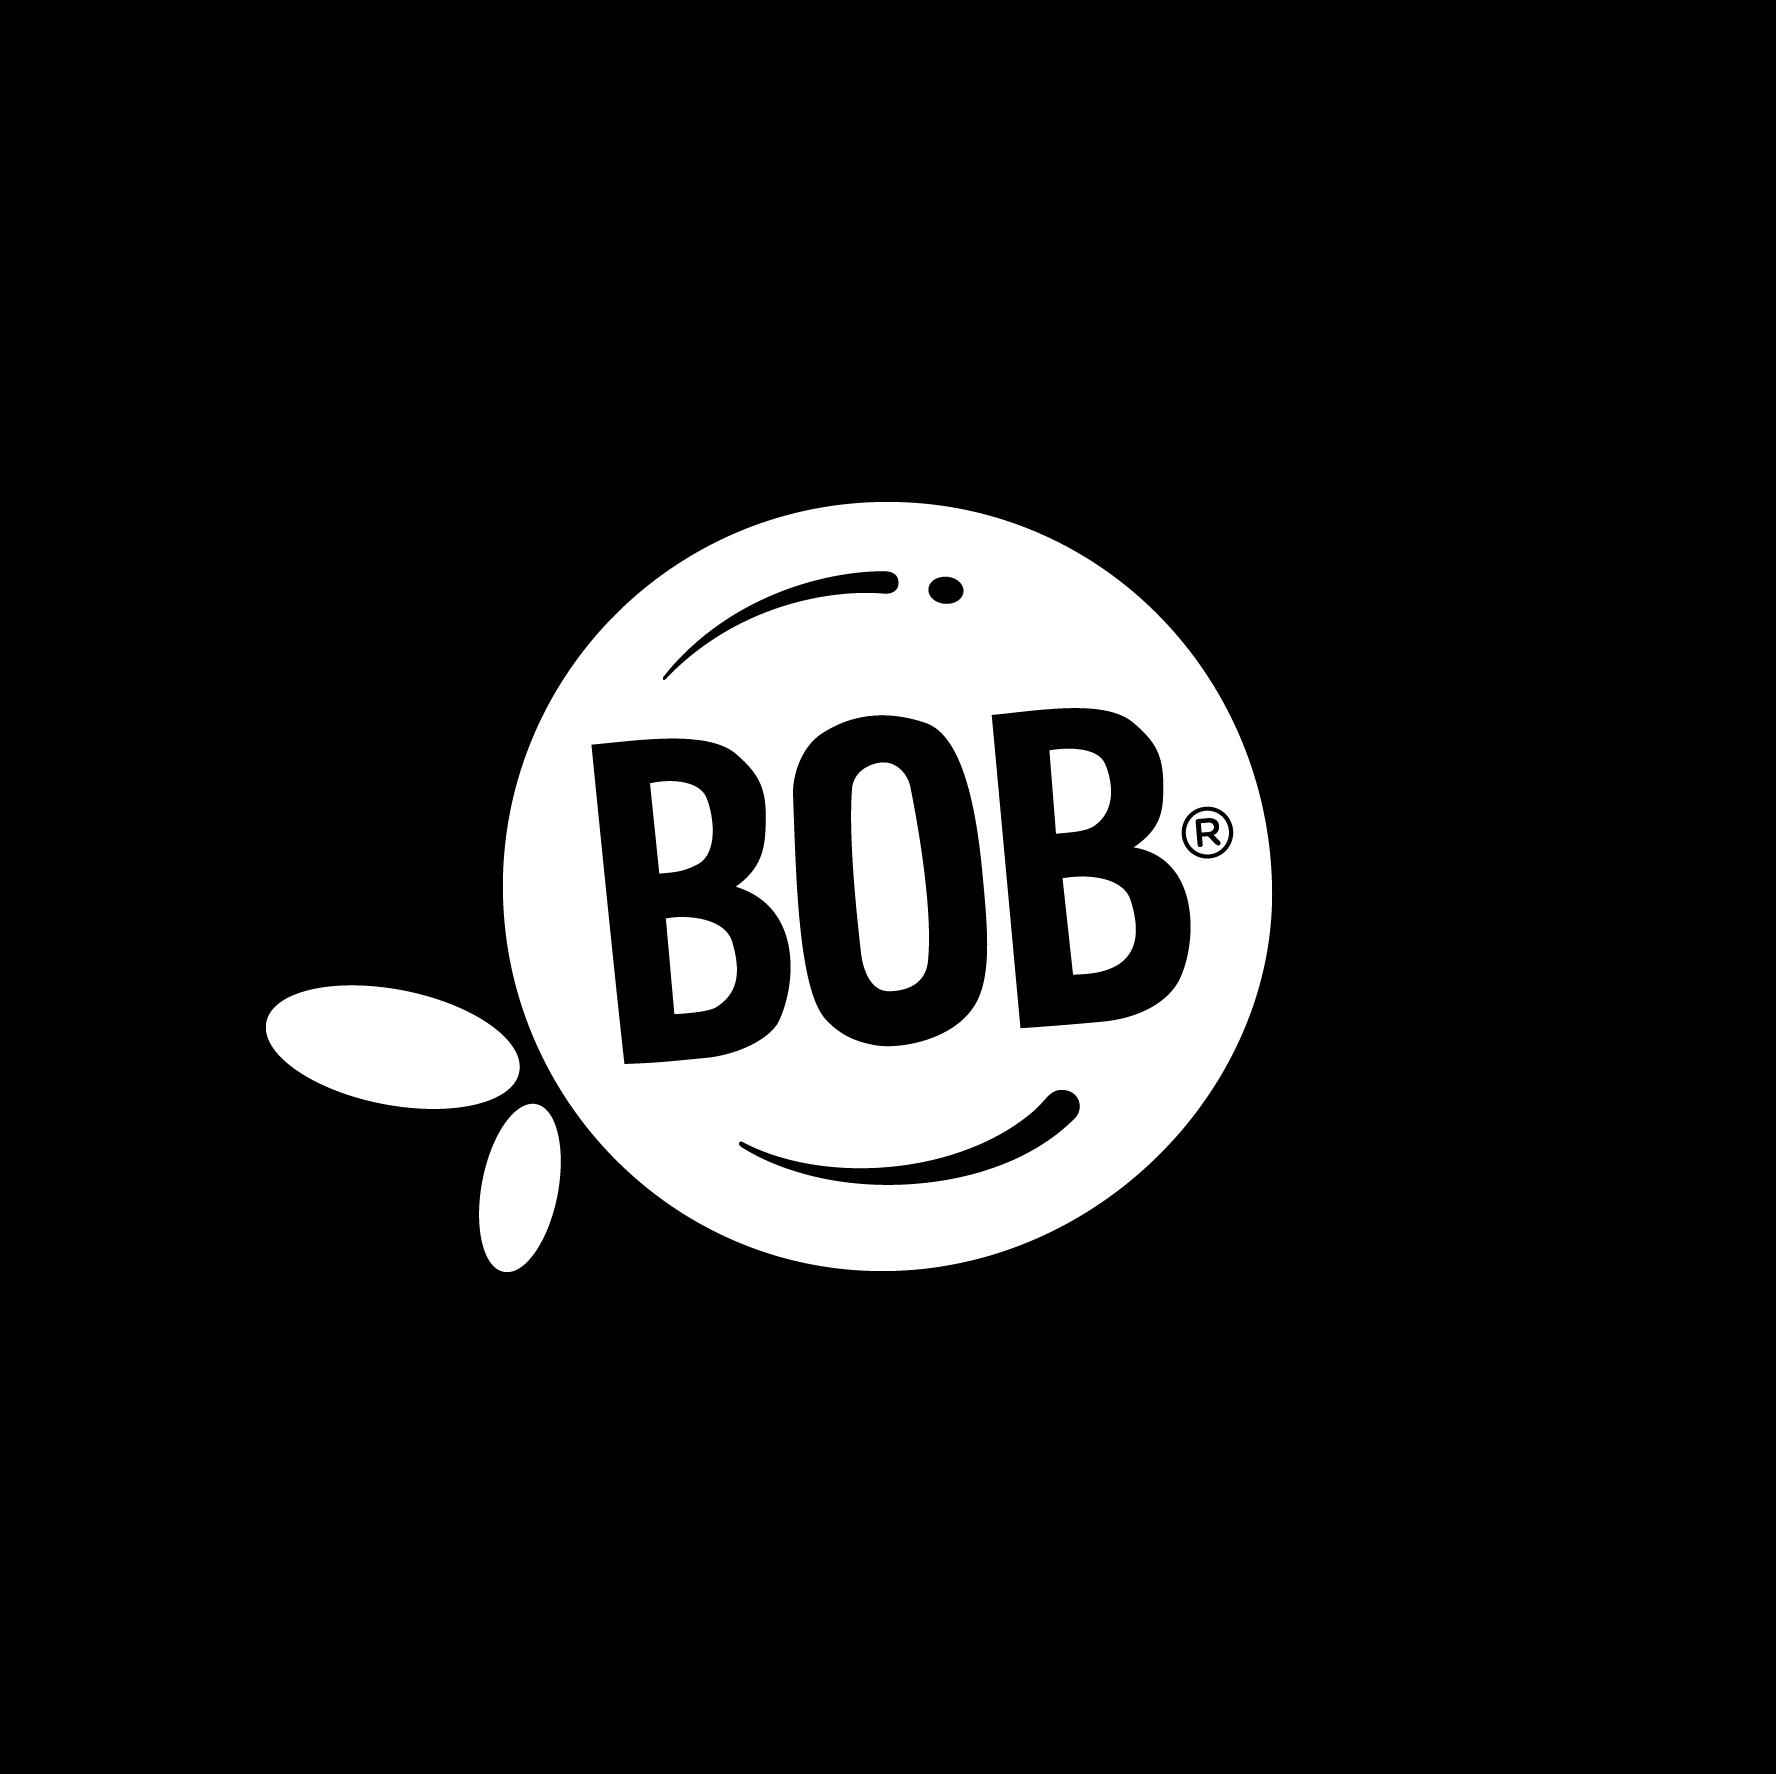 logo for bob